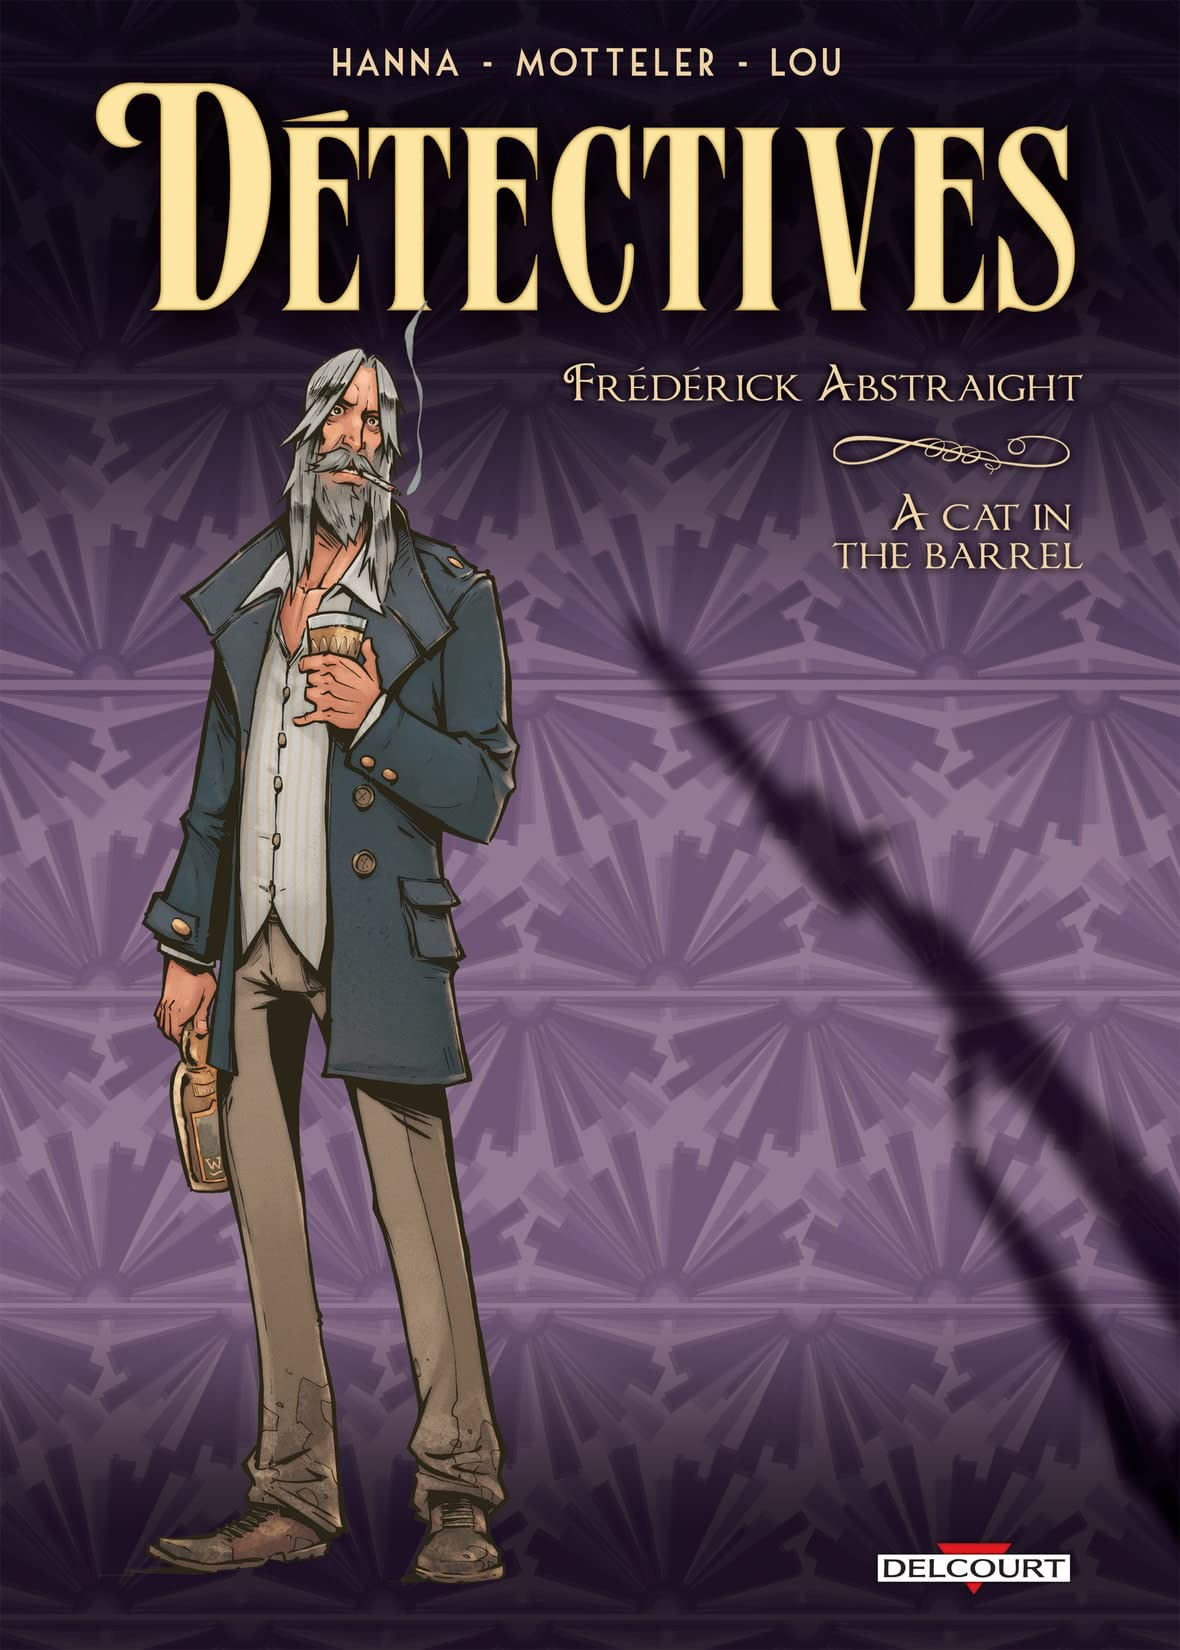 Détectives Vol. 5: Frédérick Abstraight - A cat in the barrel